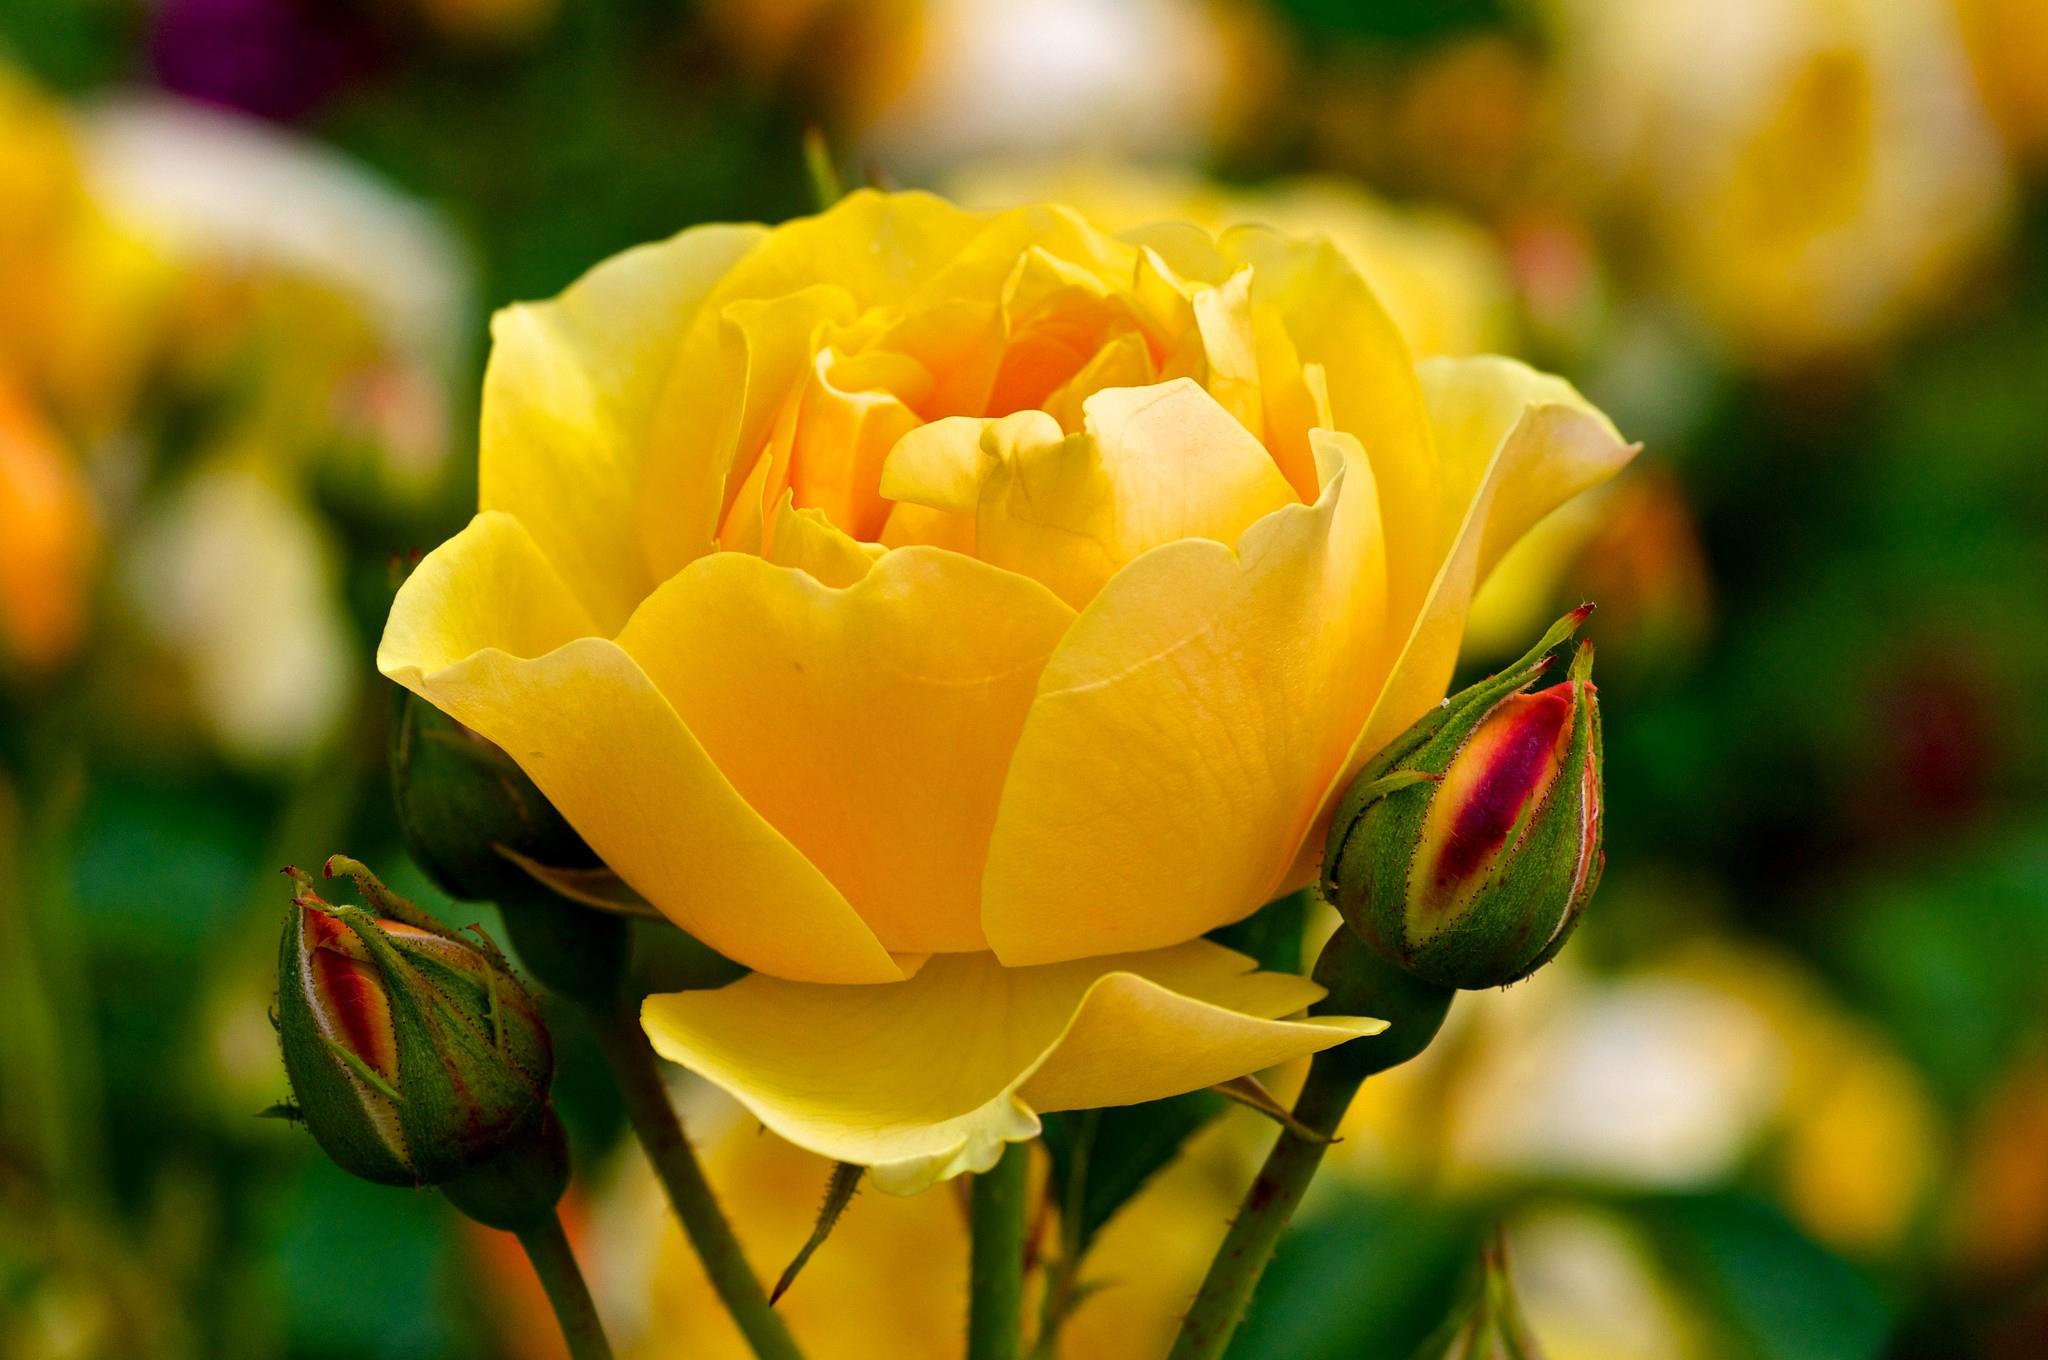 природа цветы желтые розы nature flowers yellow rose бесплатно